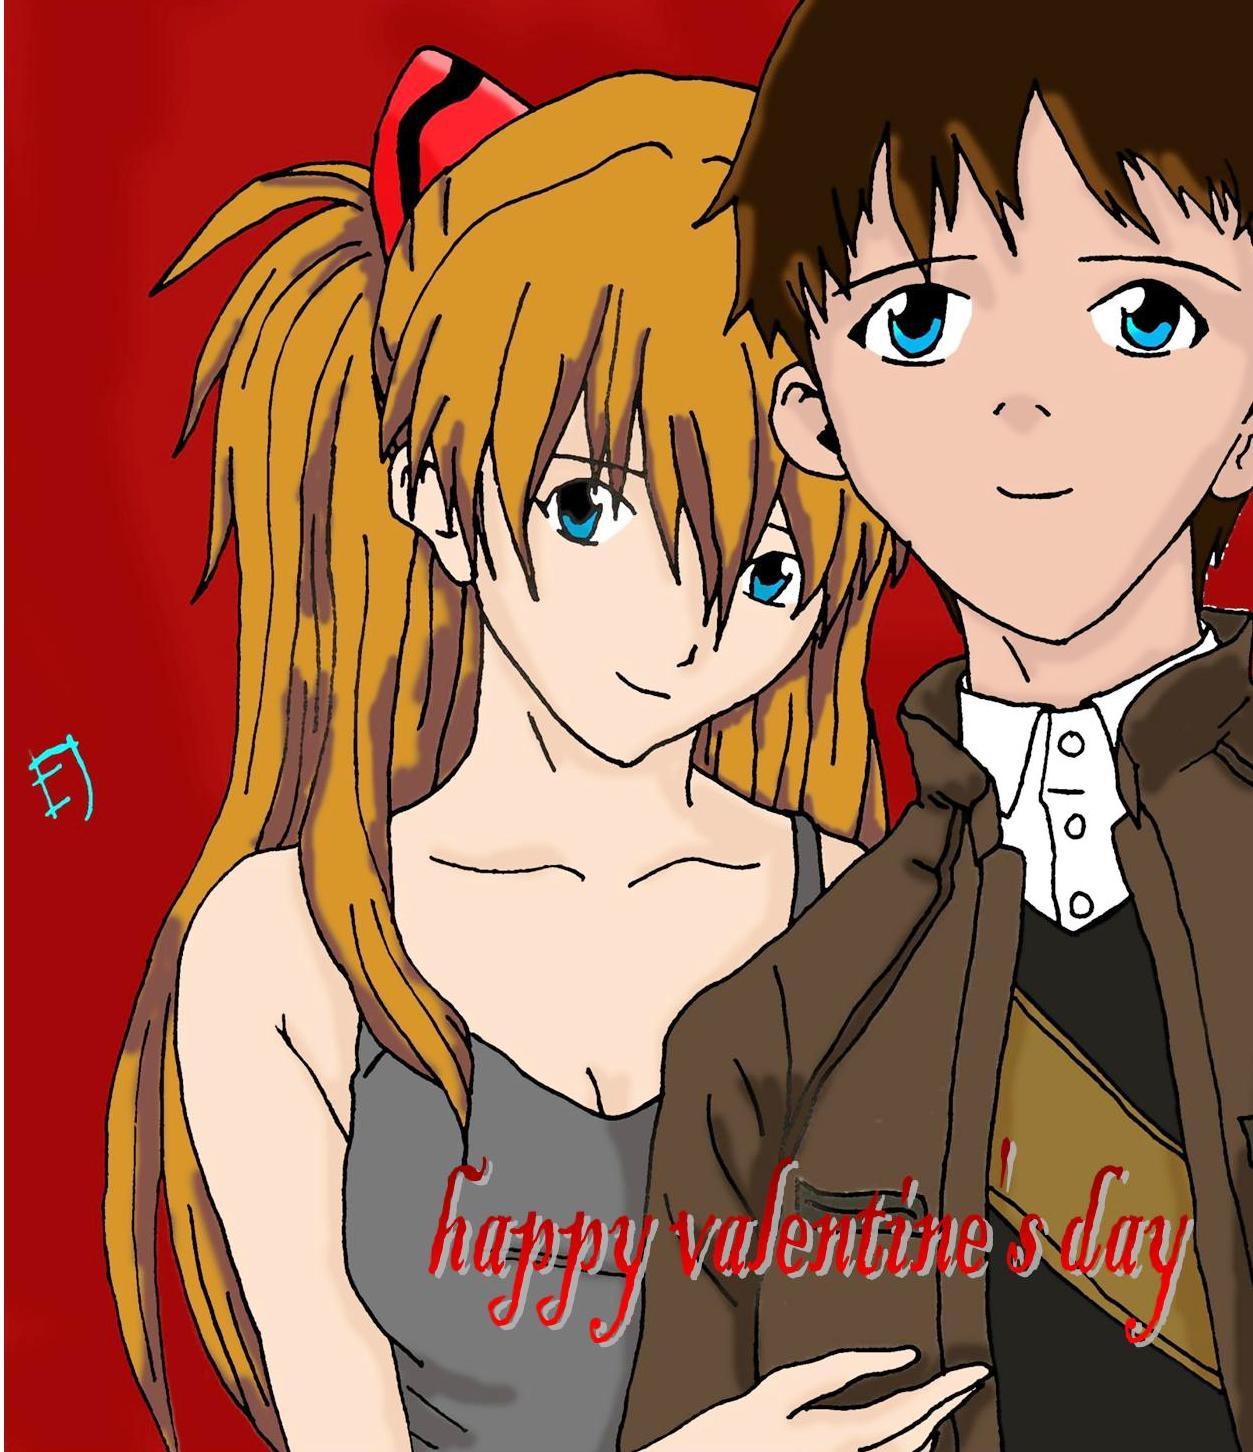 happy valentine's day by EJSalvillaAnasarias